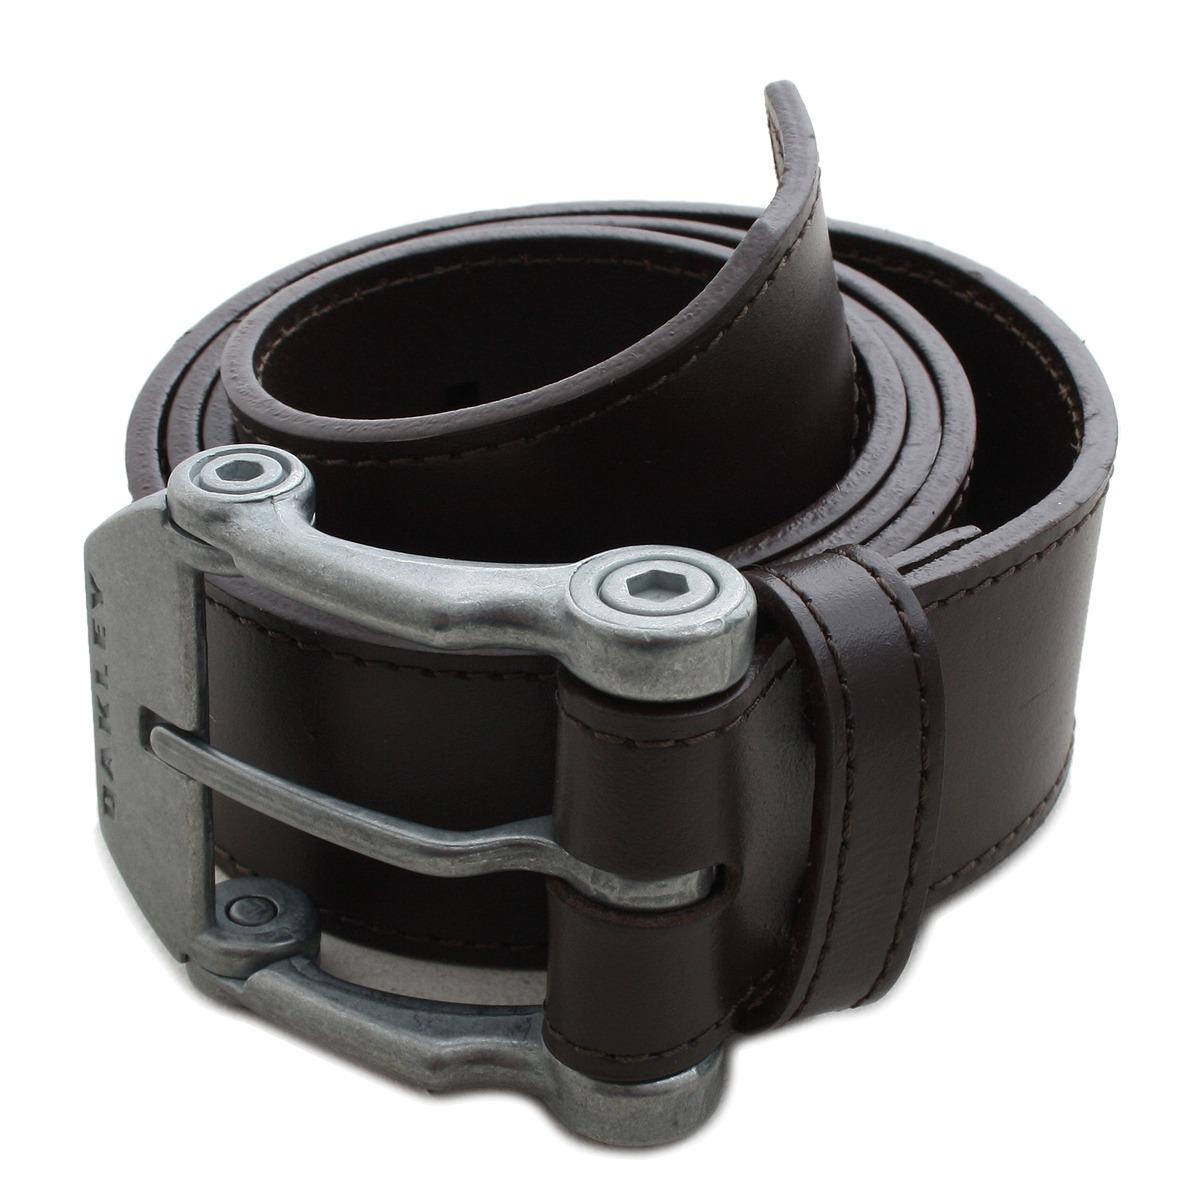 1d30abba43c58 cinto oakley couro liso marrom leather belt. Carregando zoom.